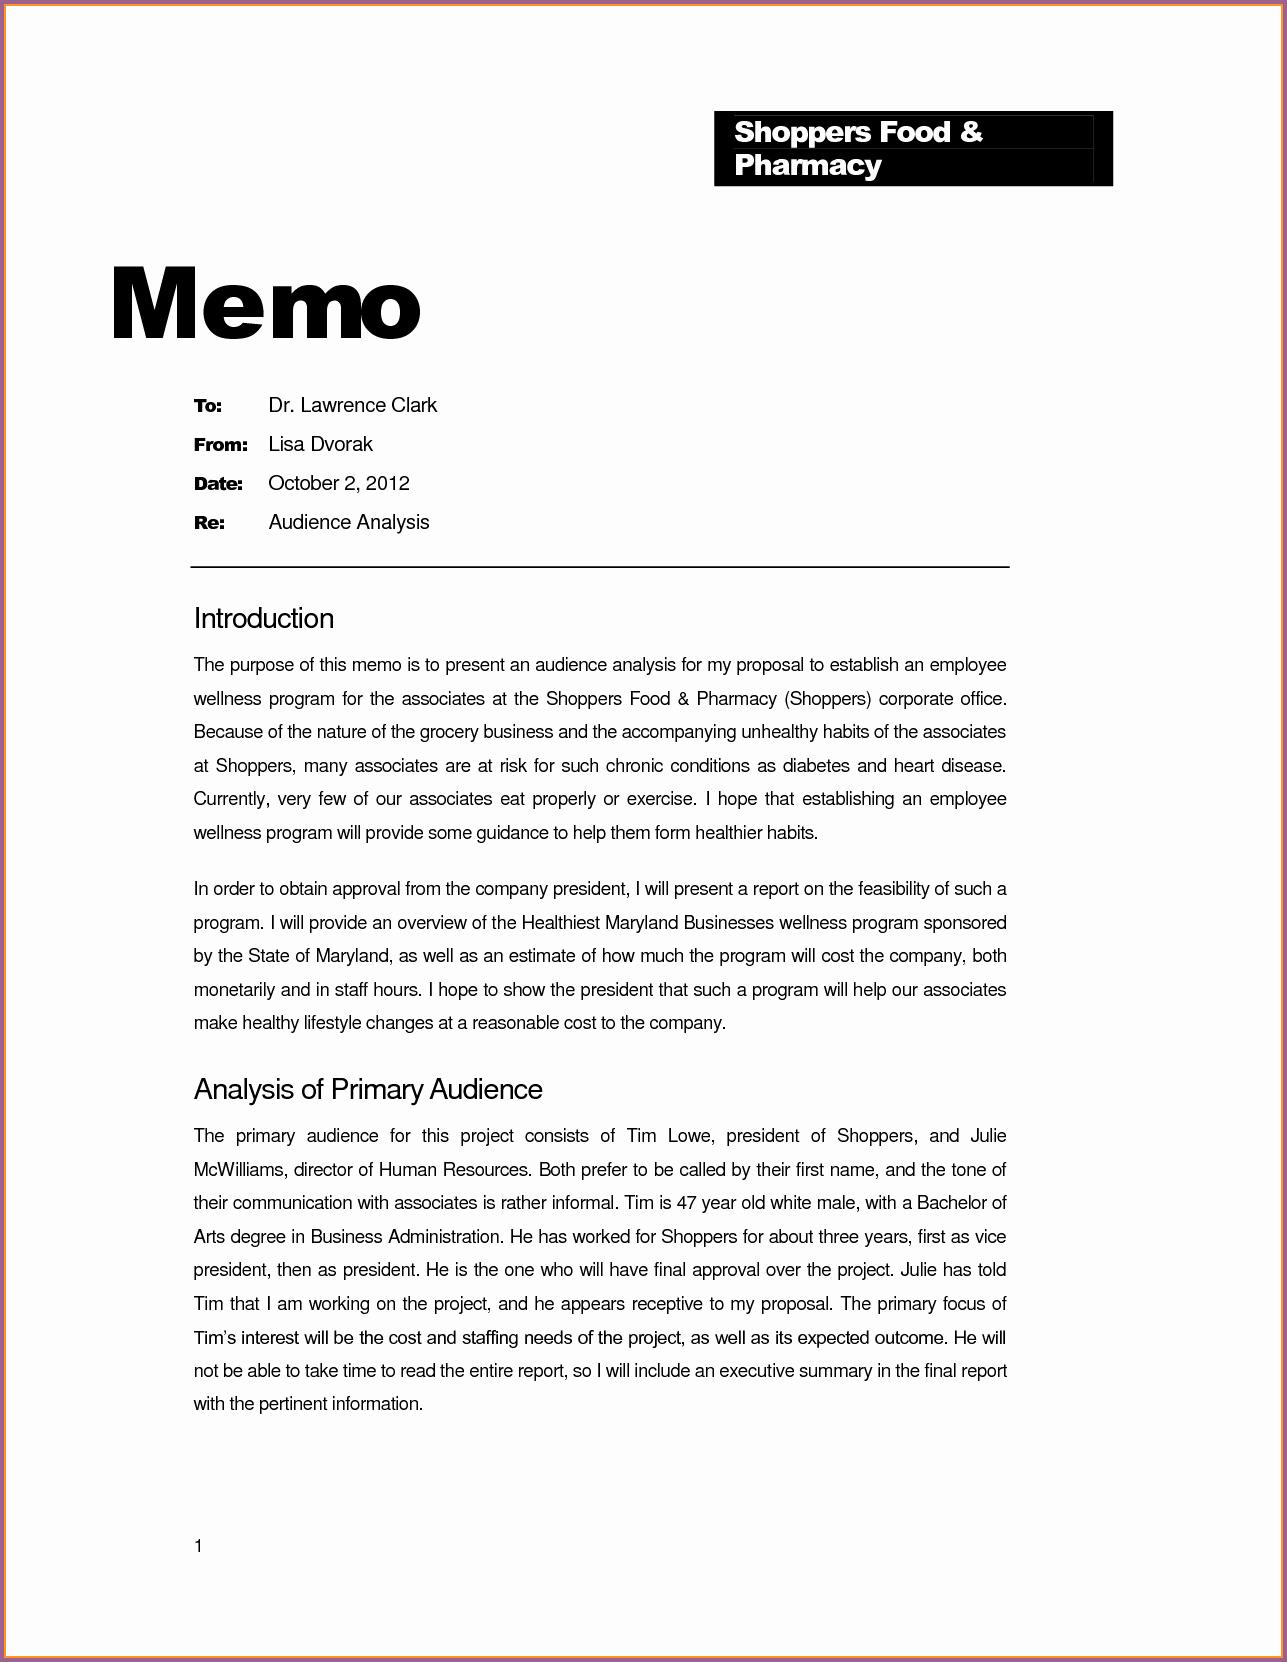 Memo Template for Word New Memo Templates for Word Portablegasgrillweber